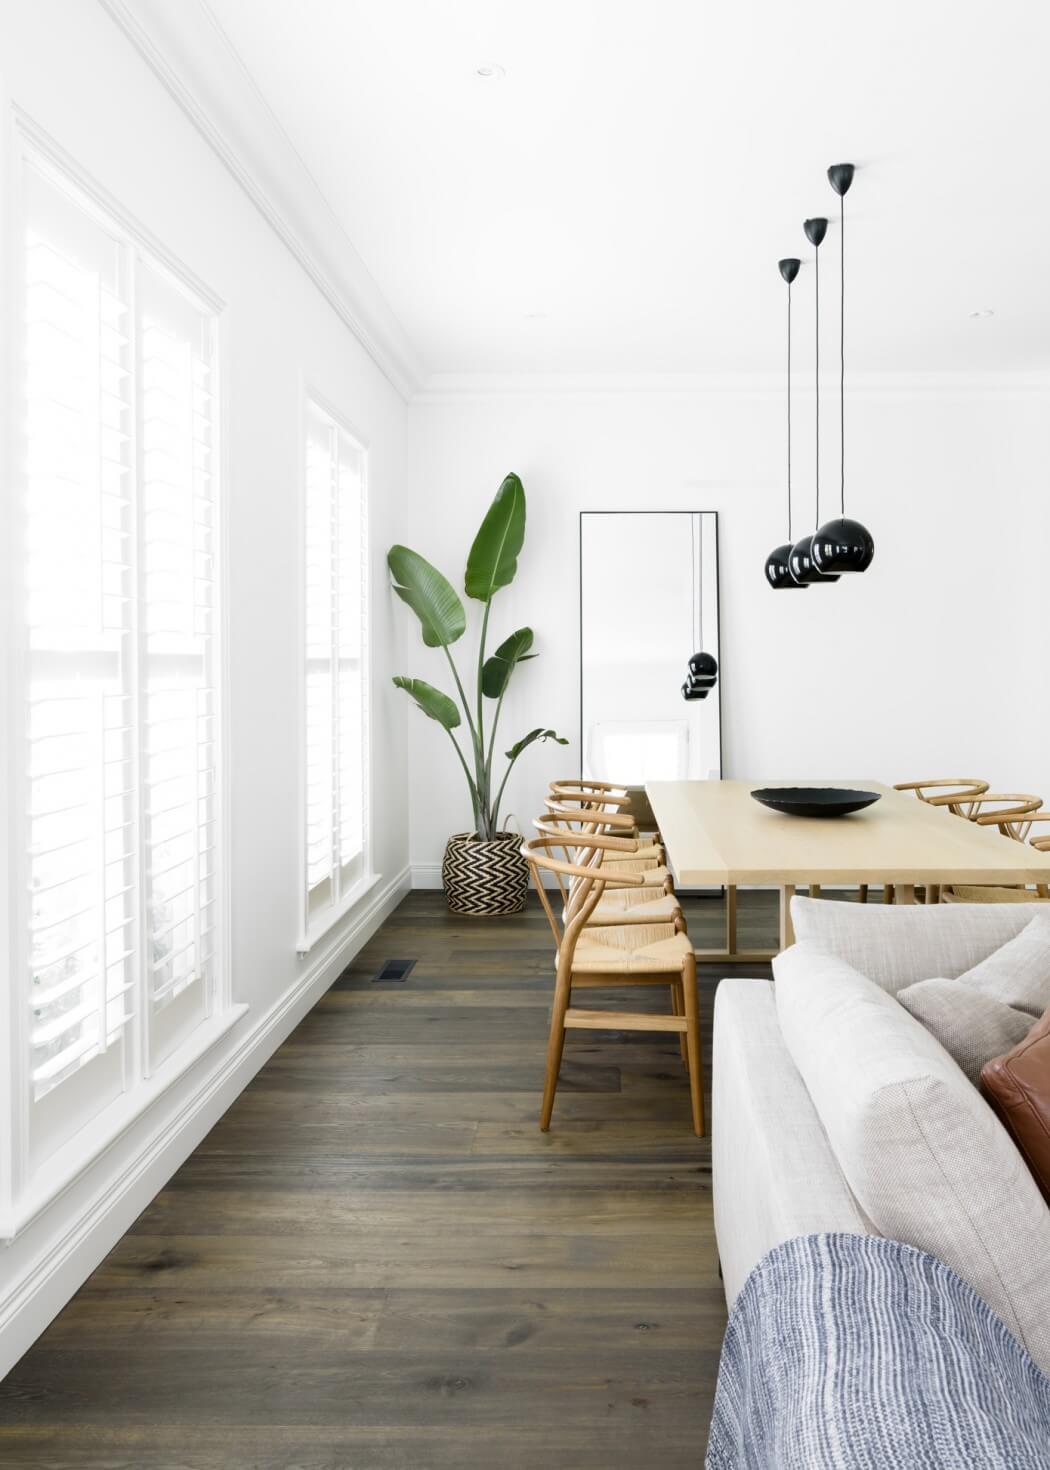 009-prk-residence-biasol-1050x1470